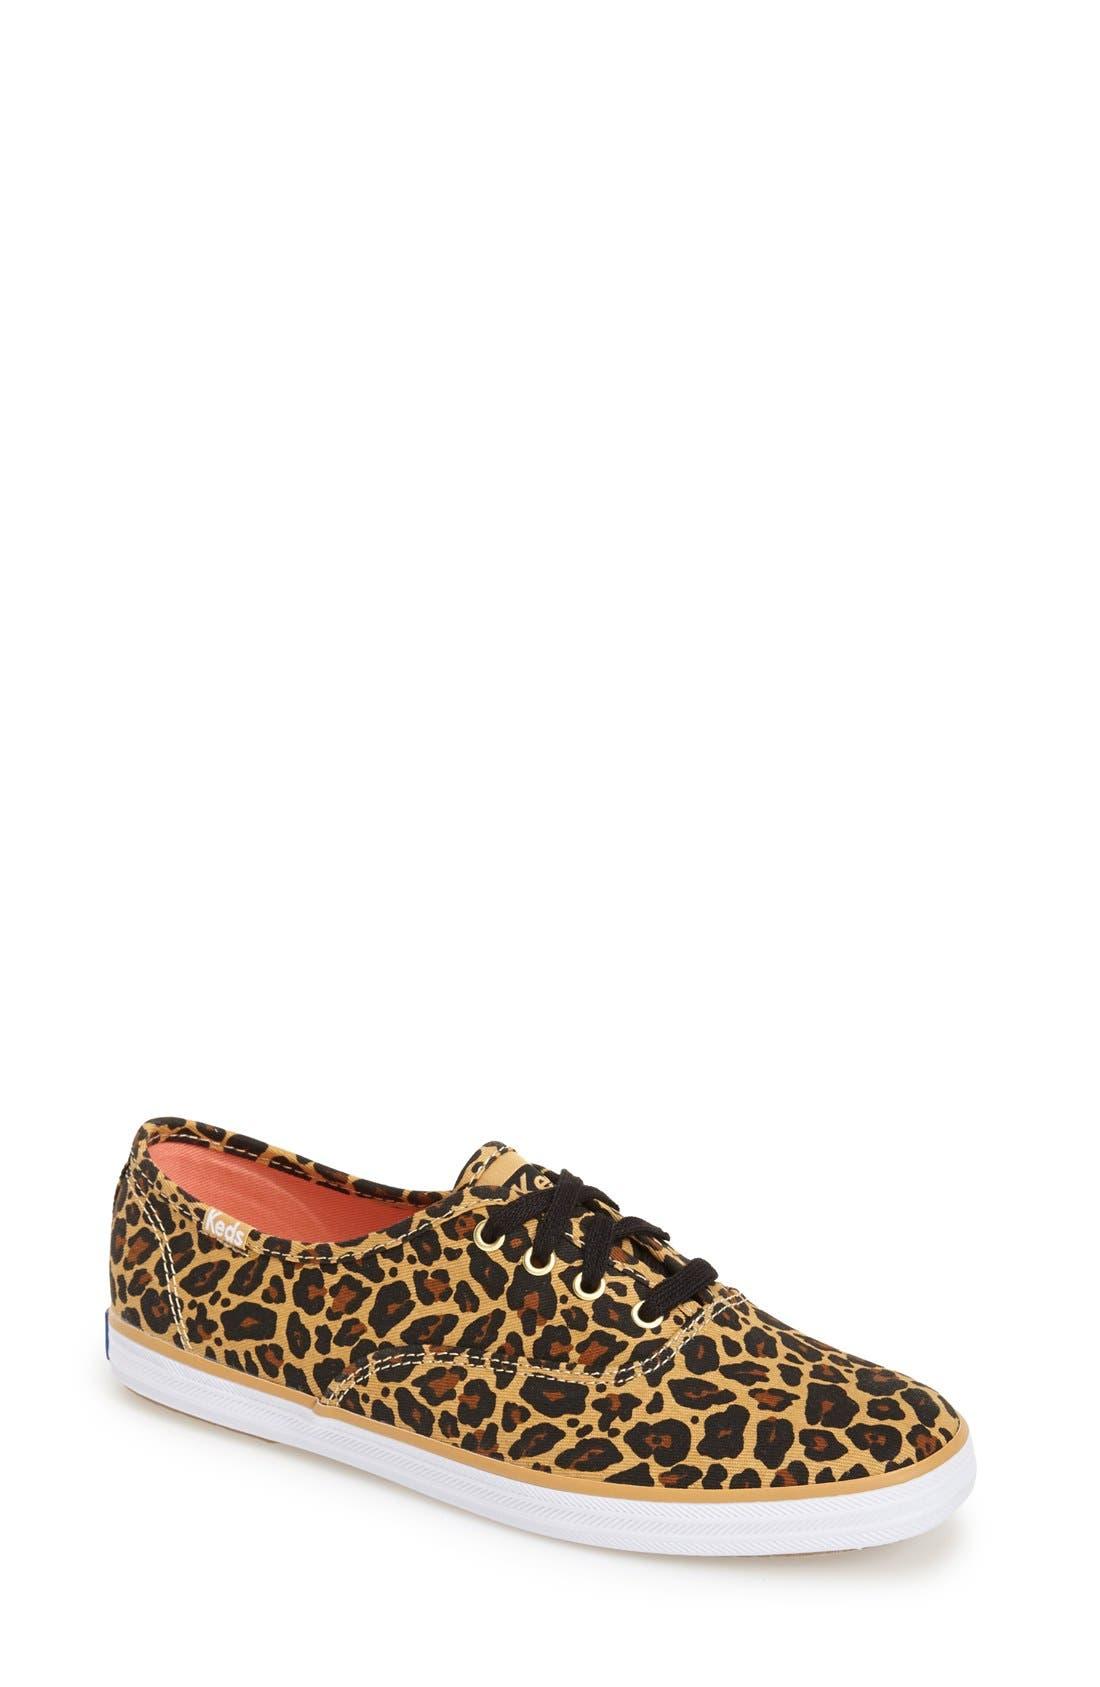 KEDS<SUP>®</SUP>,                             'Champion' Leopard Print Sneaker,                             Main thumbnail 1, color,                             230